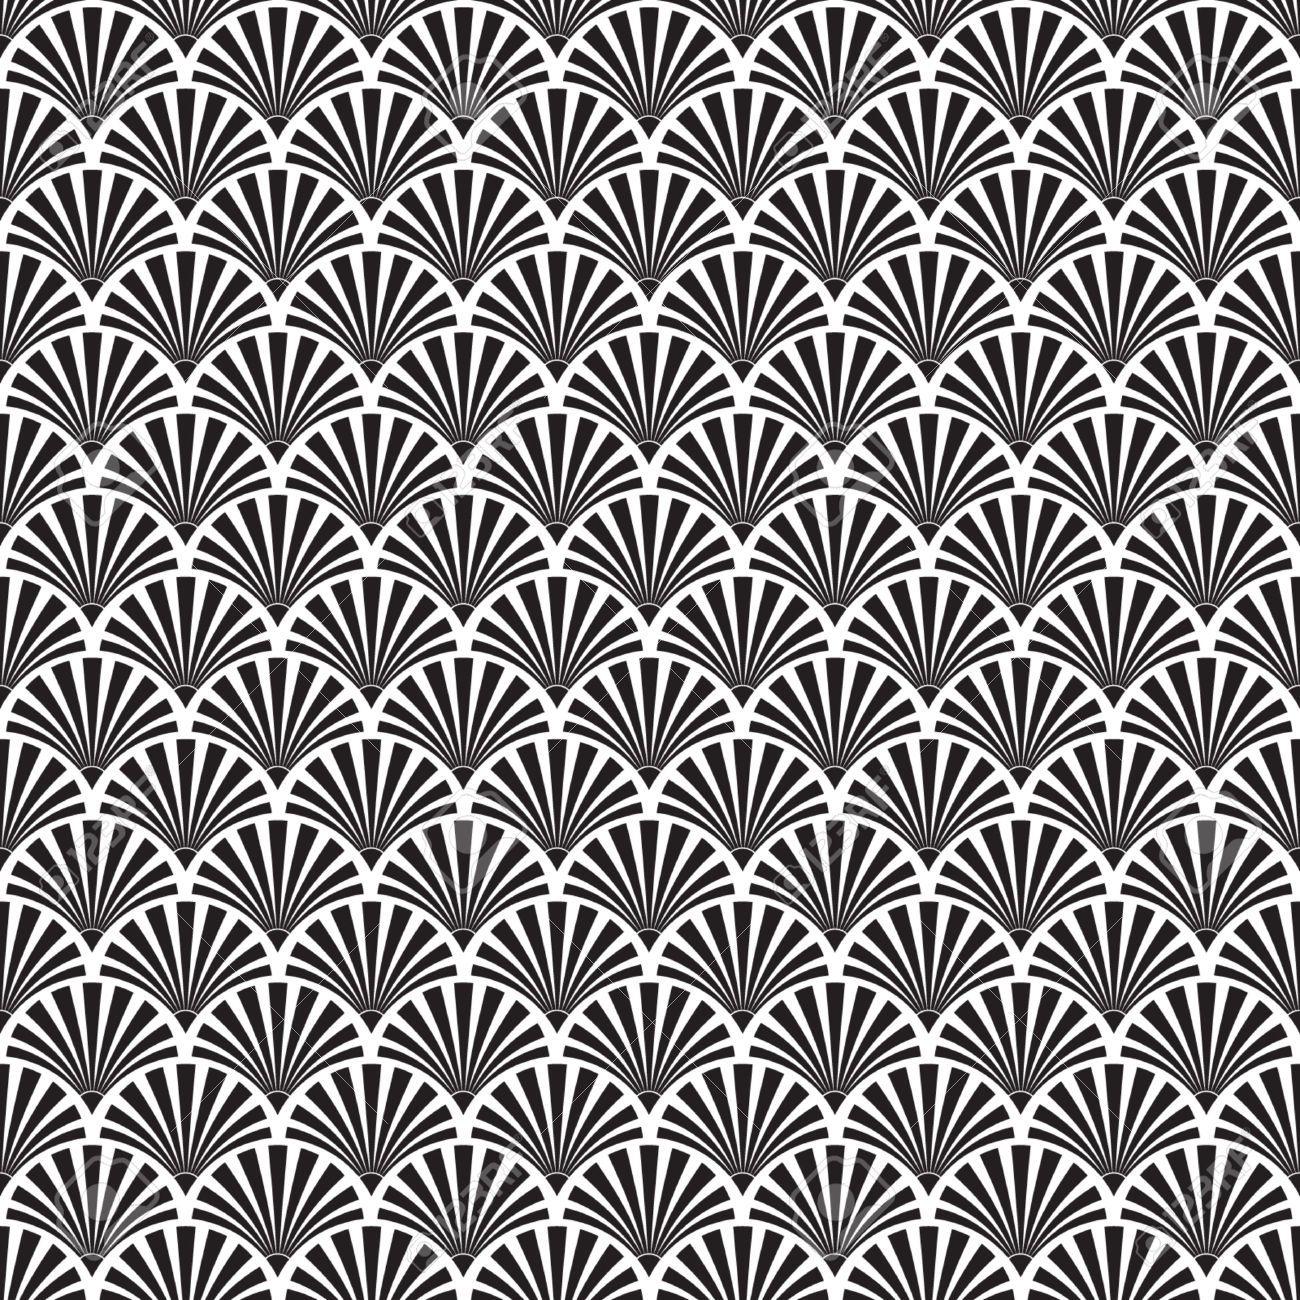 1300x1300 Art Deco Vector Pattern